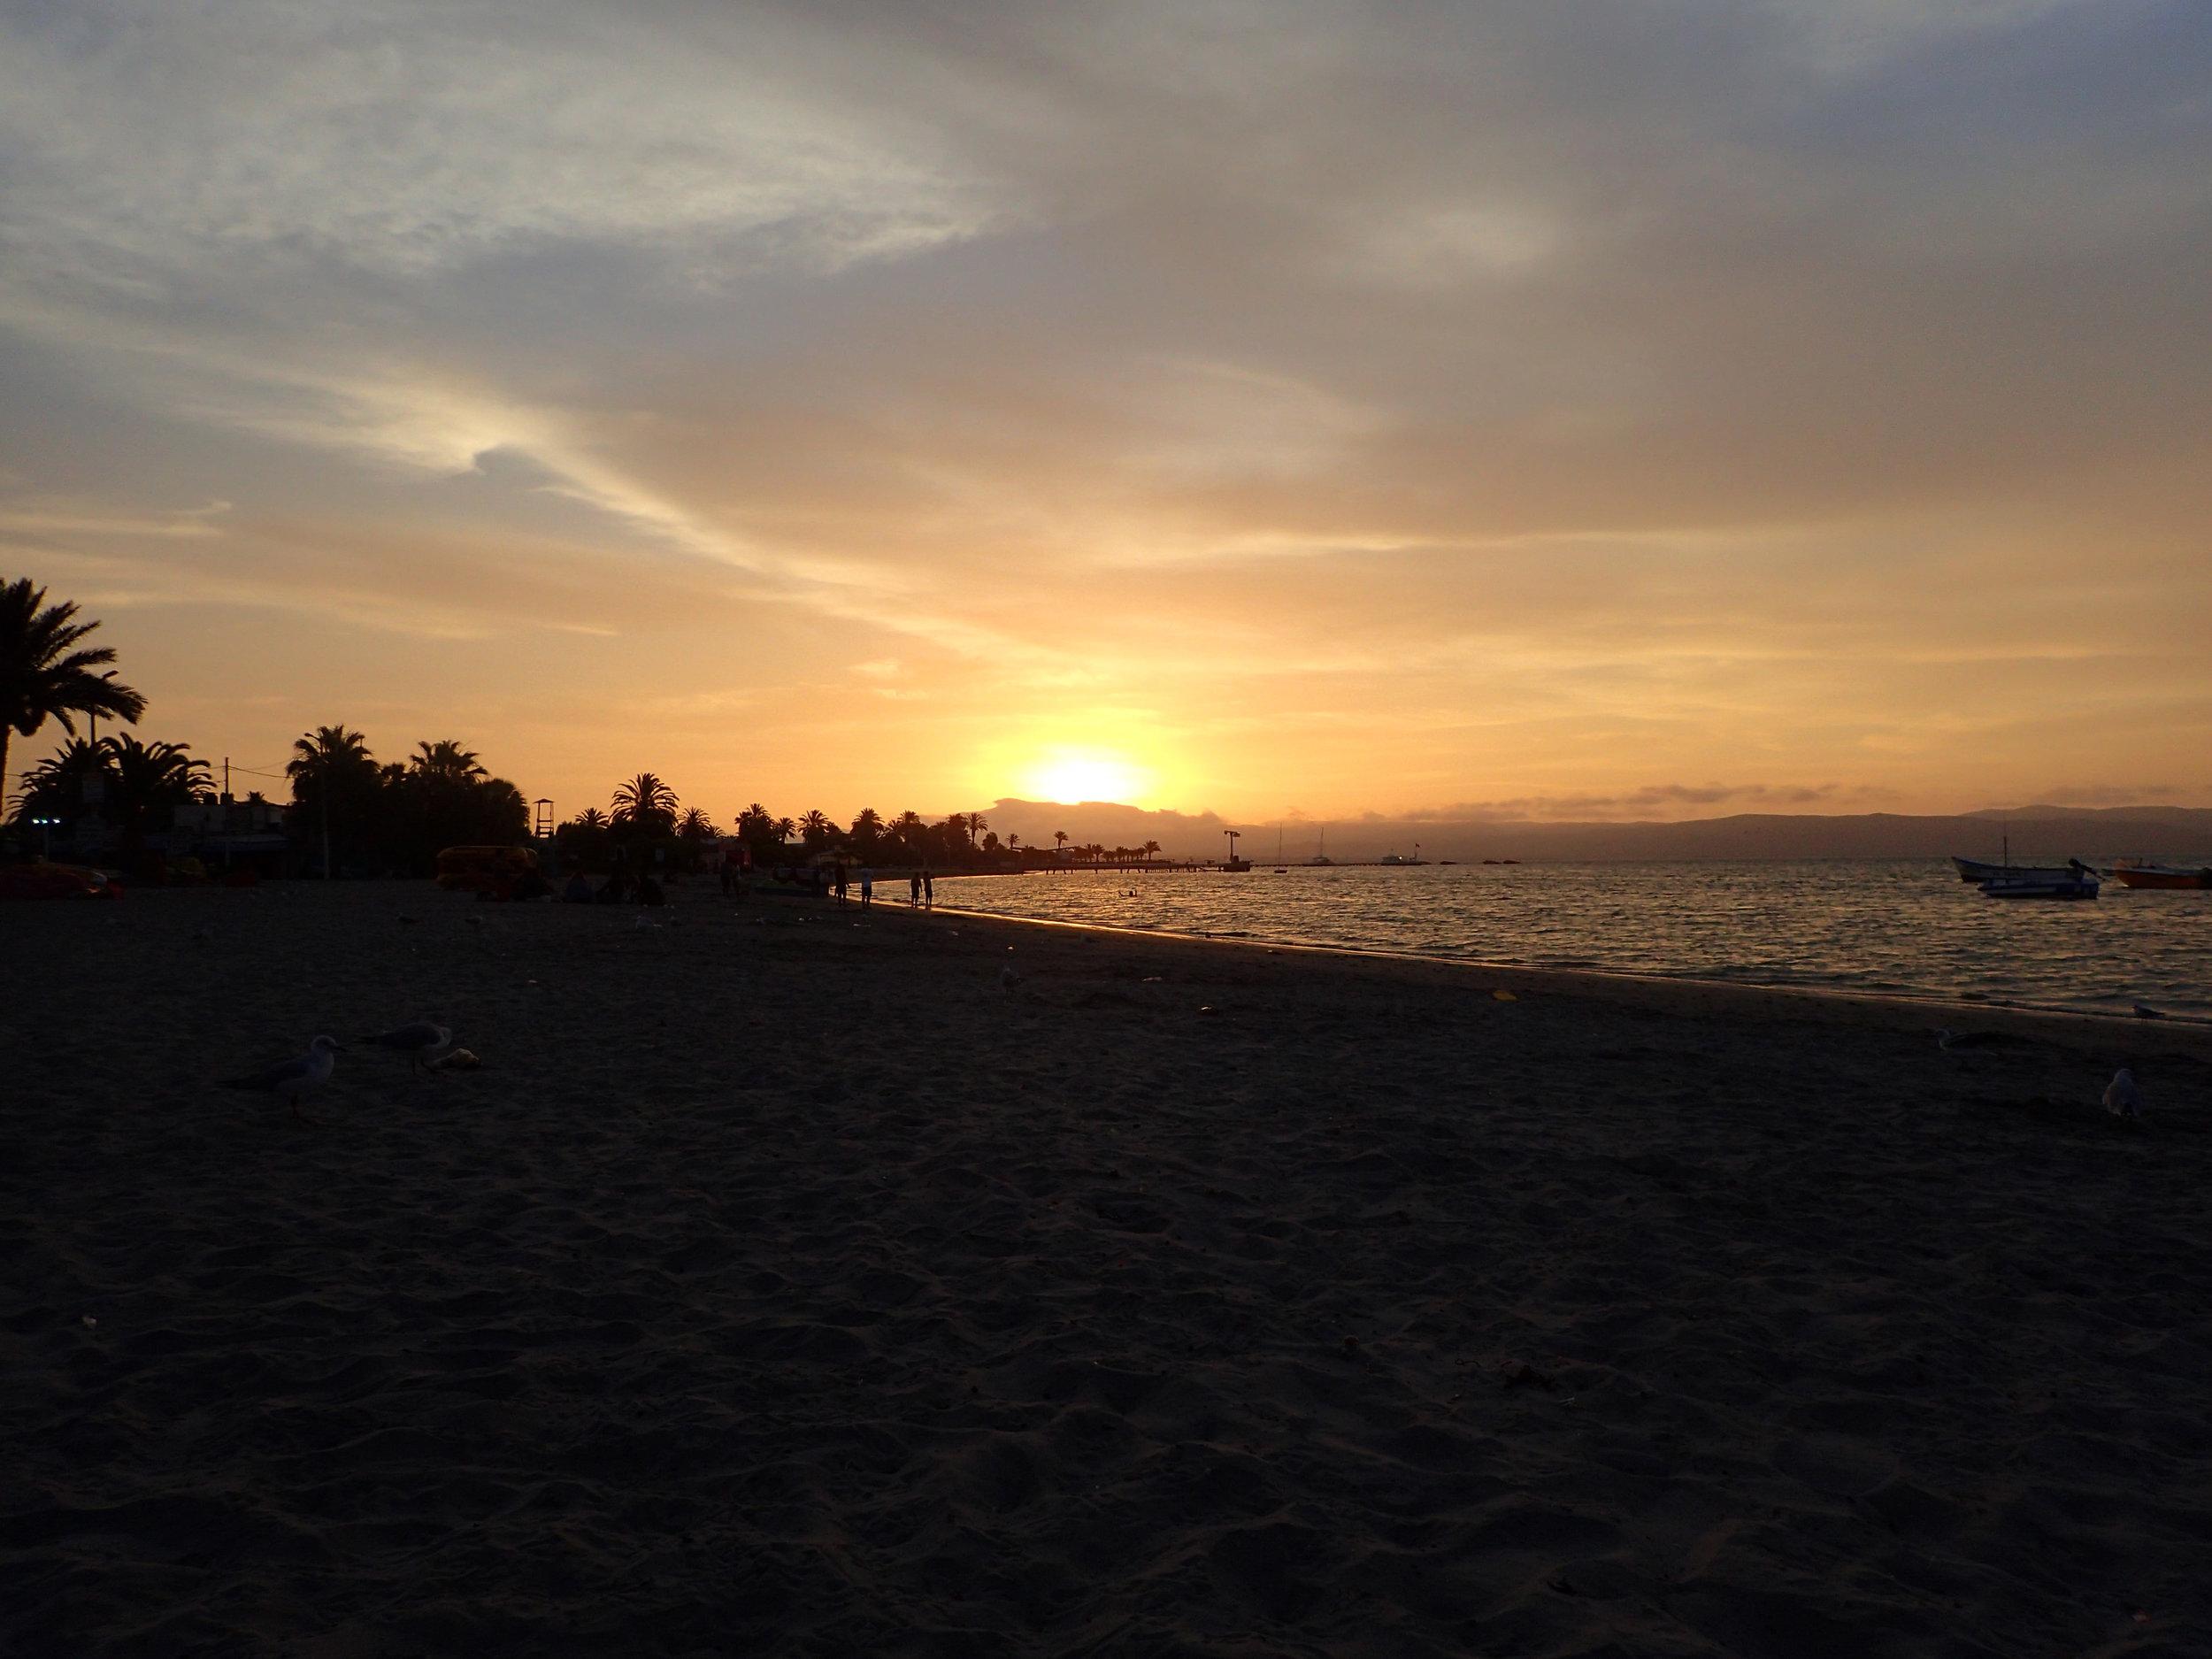 good sunset shot 1-9-18.jpg